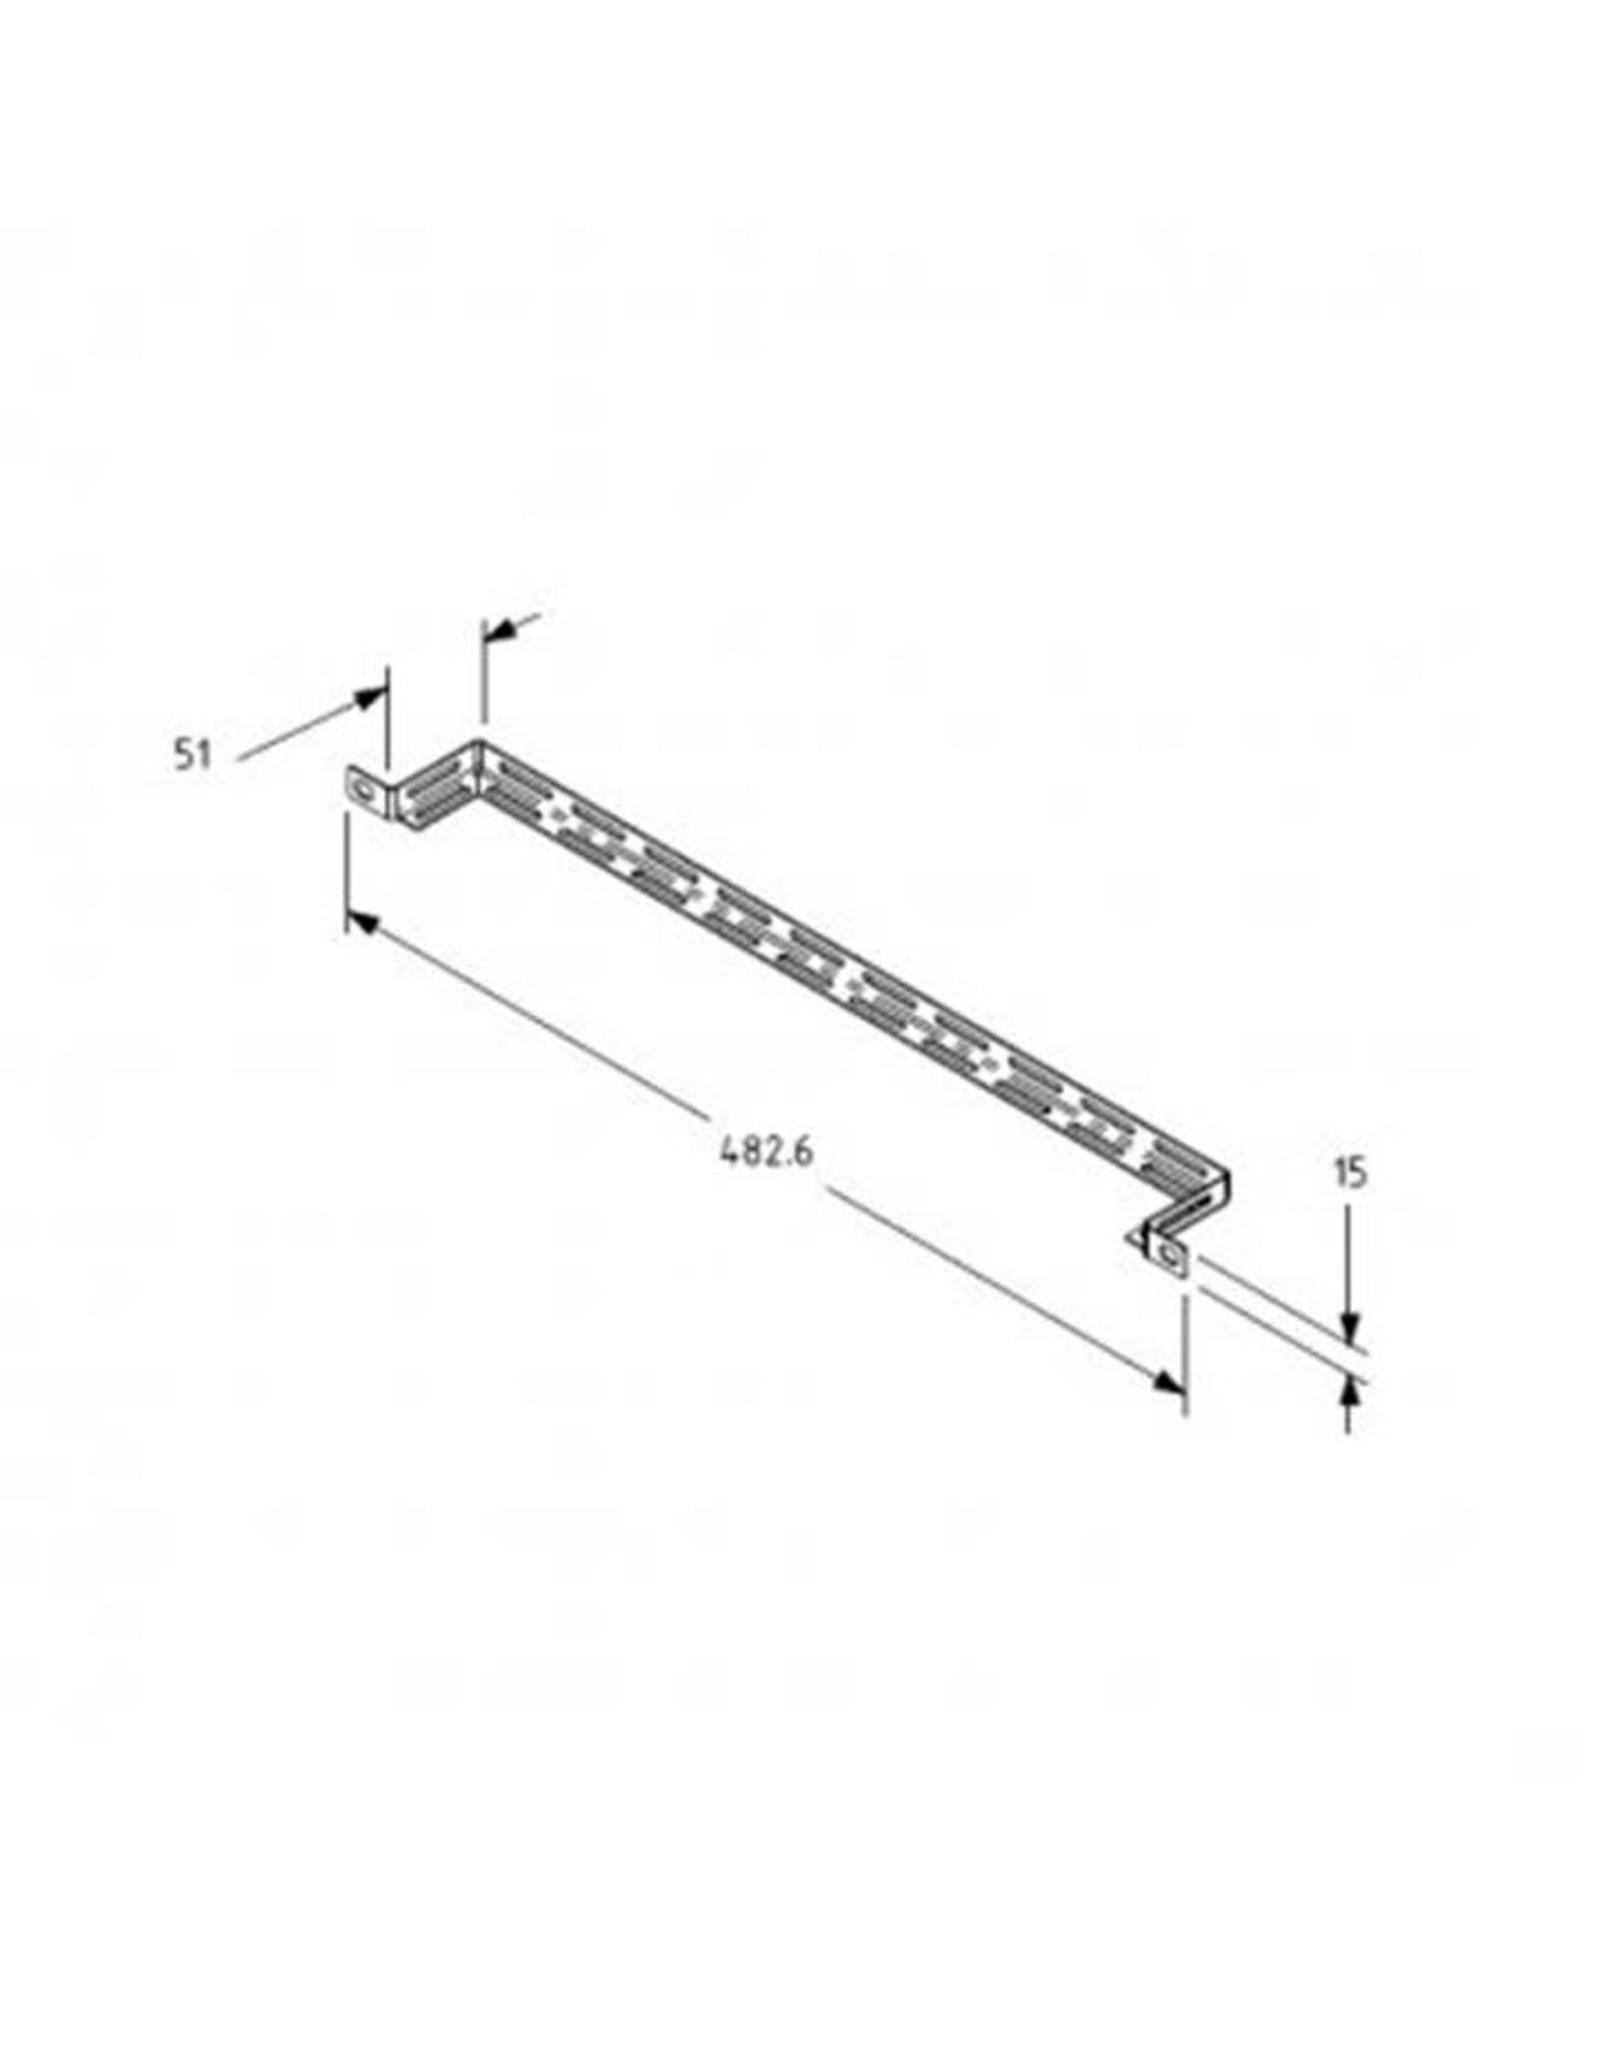 Penn Elcom Penn Elcom 19 inch rack mount cable support tie-bar, 51 mm